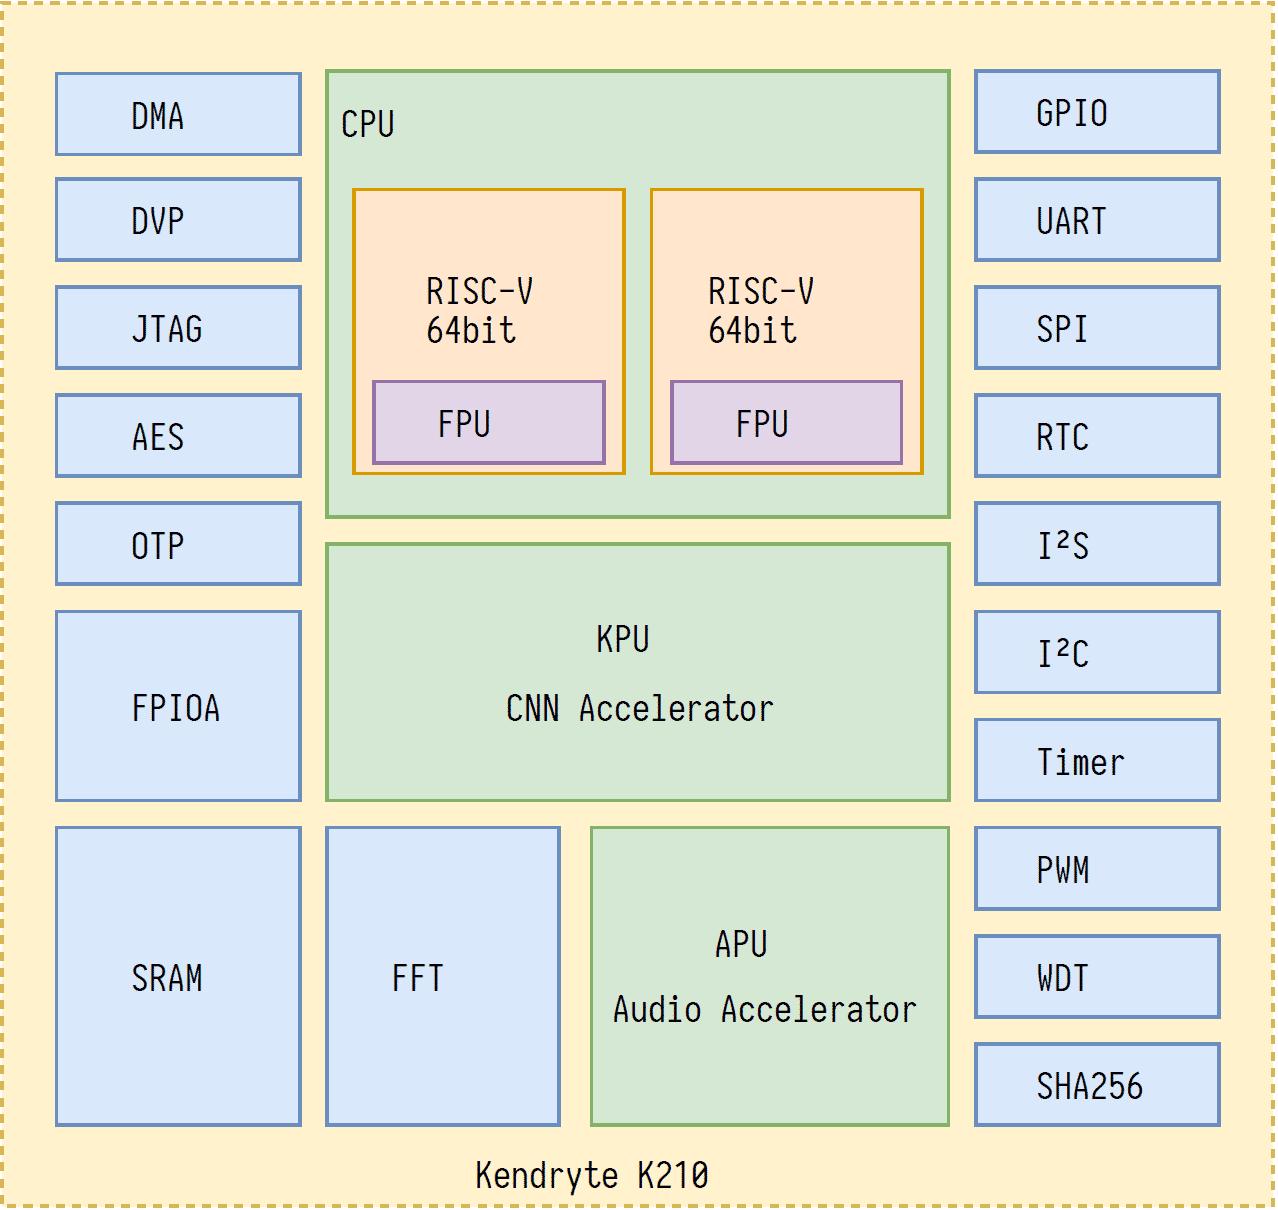 Blockschaltbild RISC-V-Mikrocontroller Kendryte K210